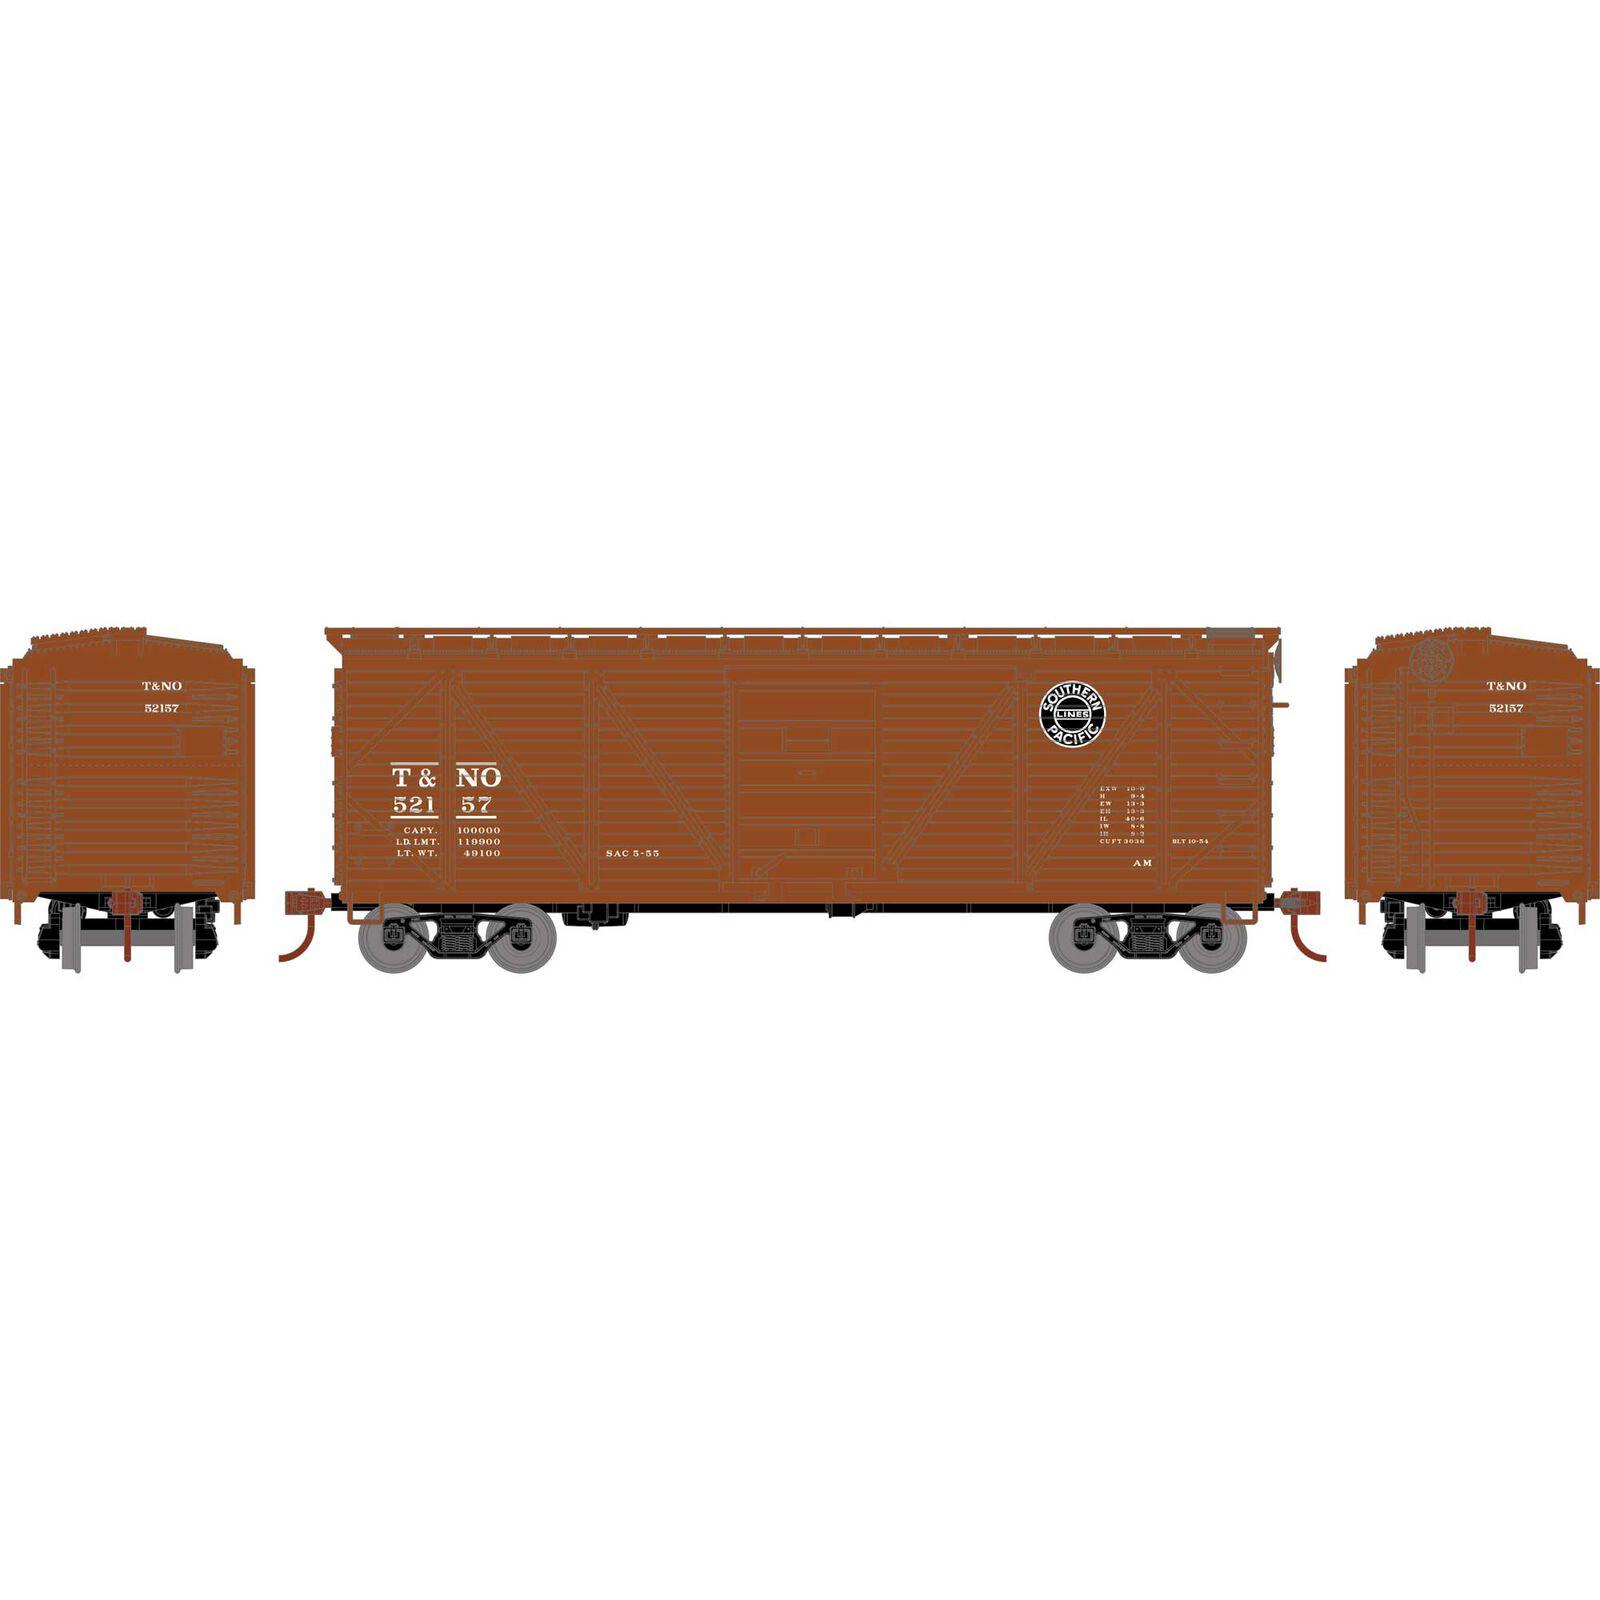 HO 40' Single Sheathed Box, T&NO #52157